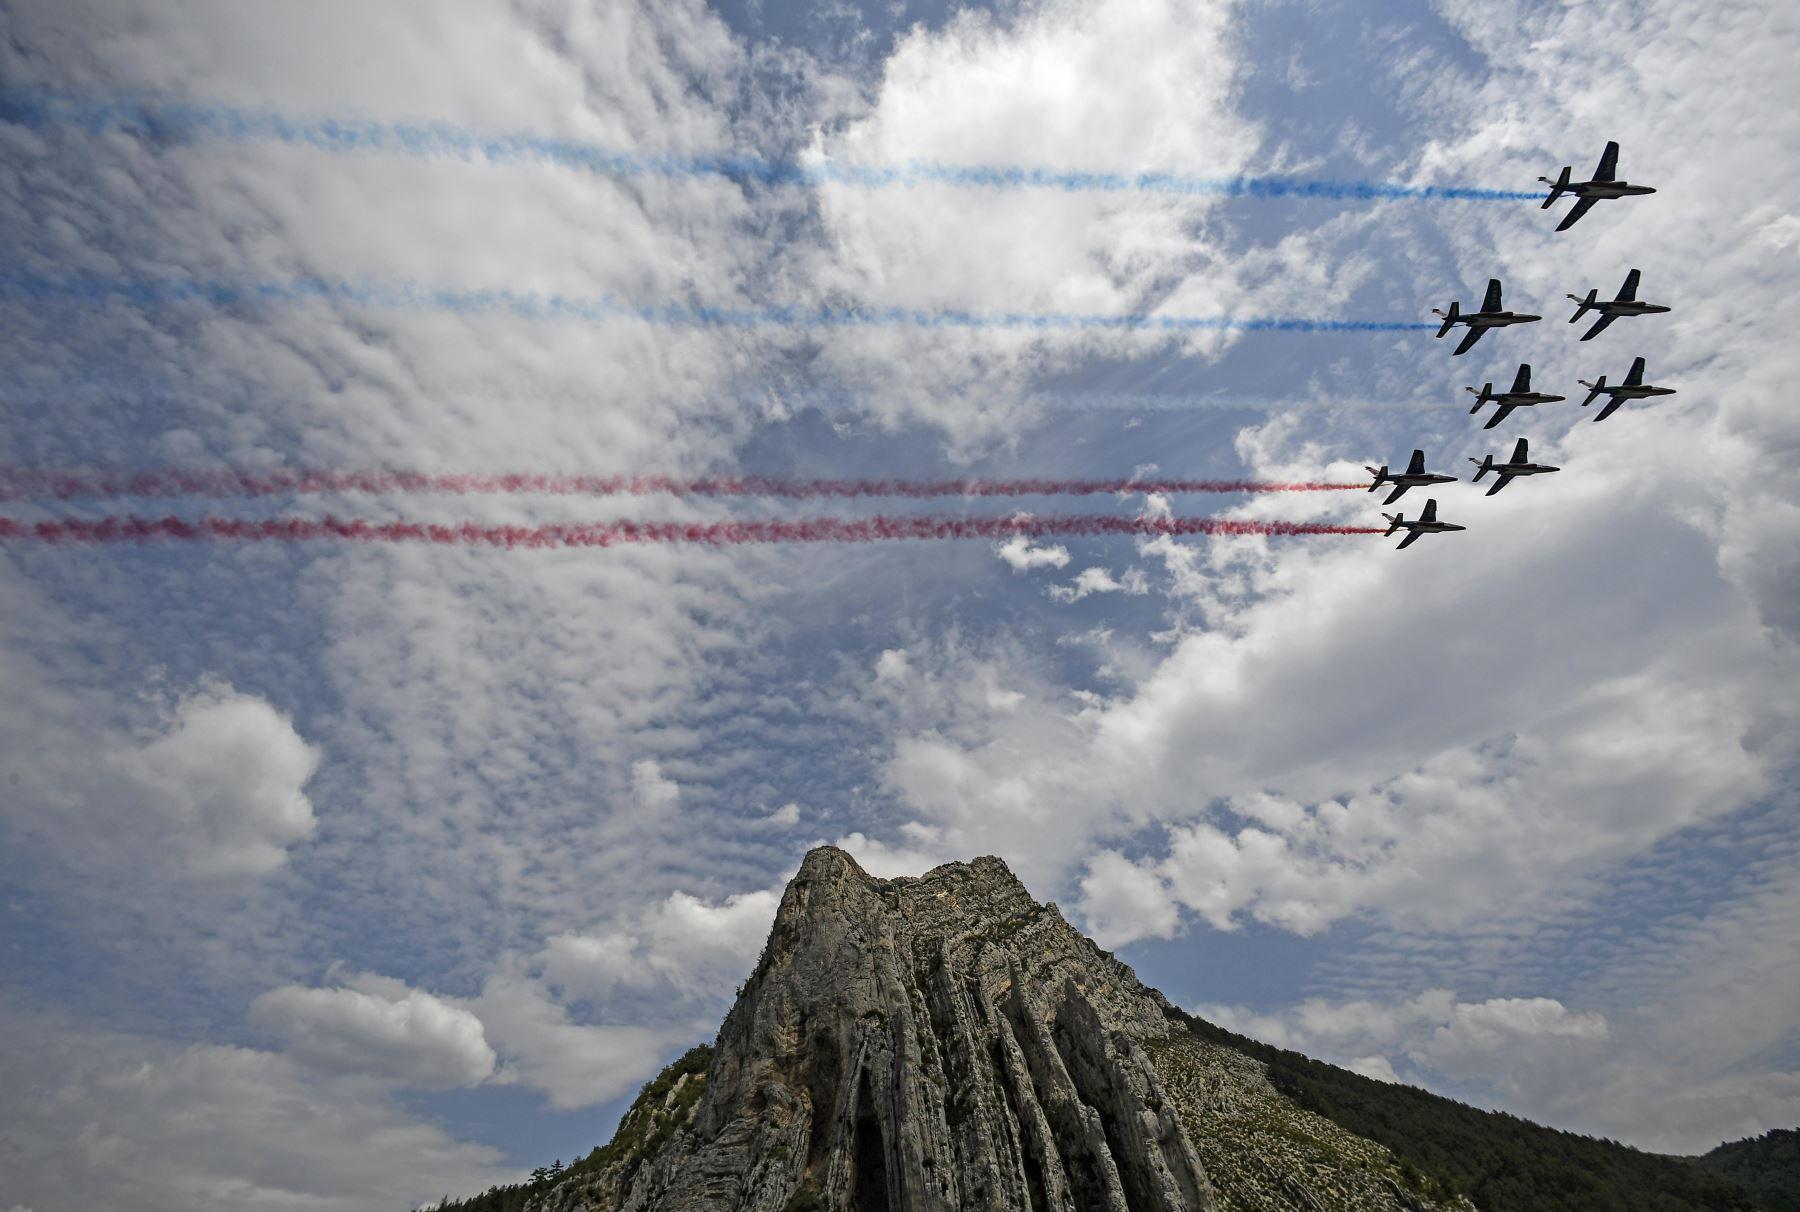 Los AlphaJet francés vuelan sobre el Rocher de la Baume en Francia. Foto: AFP